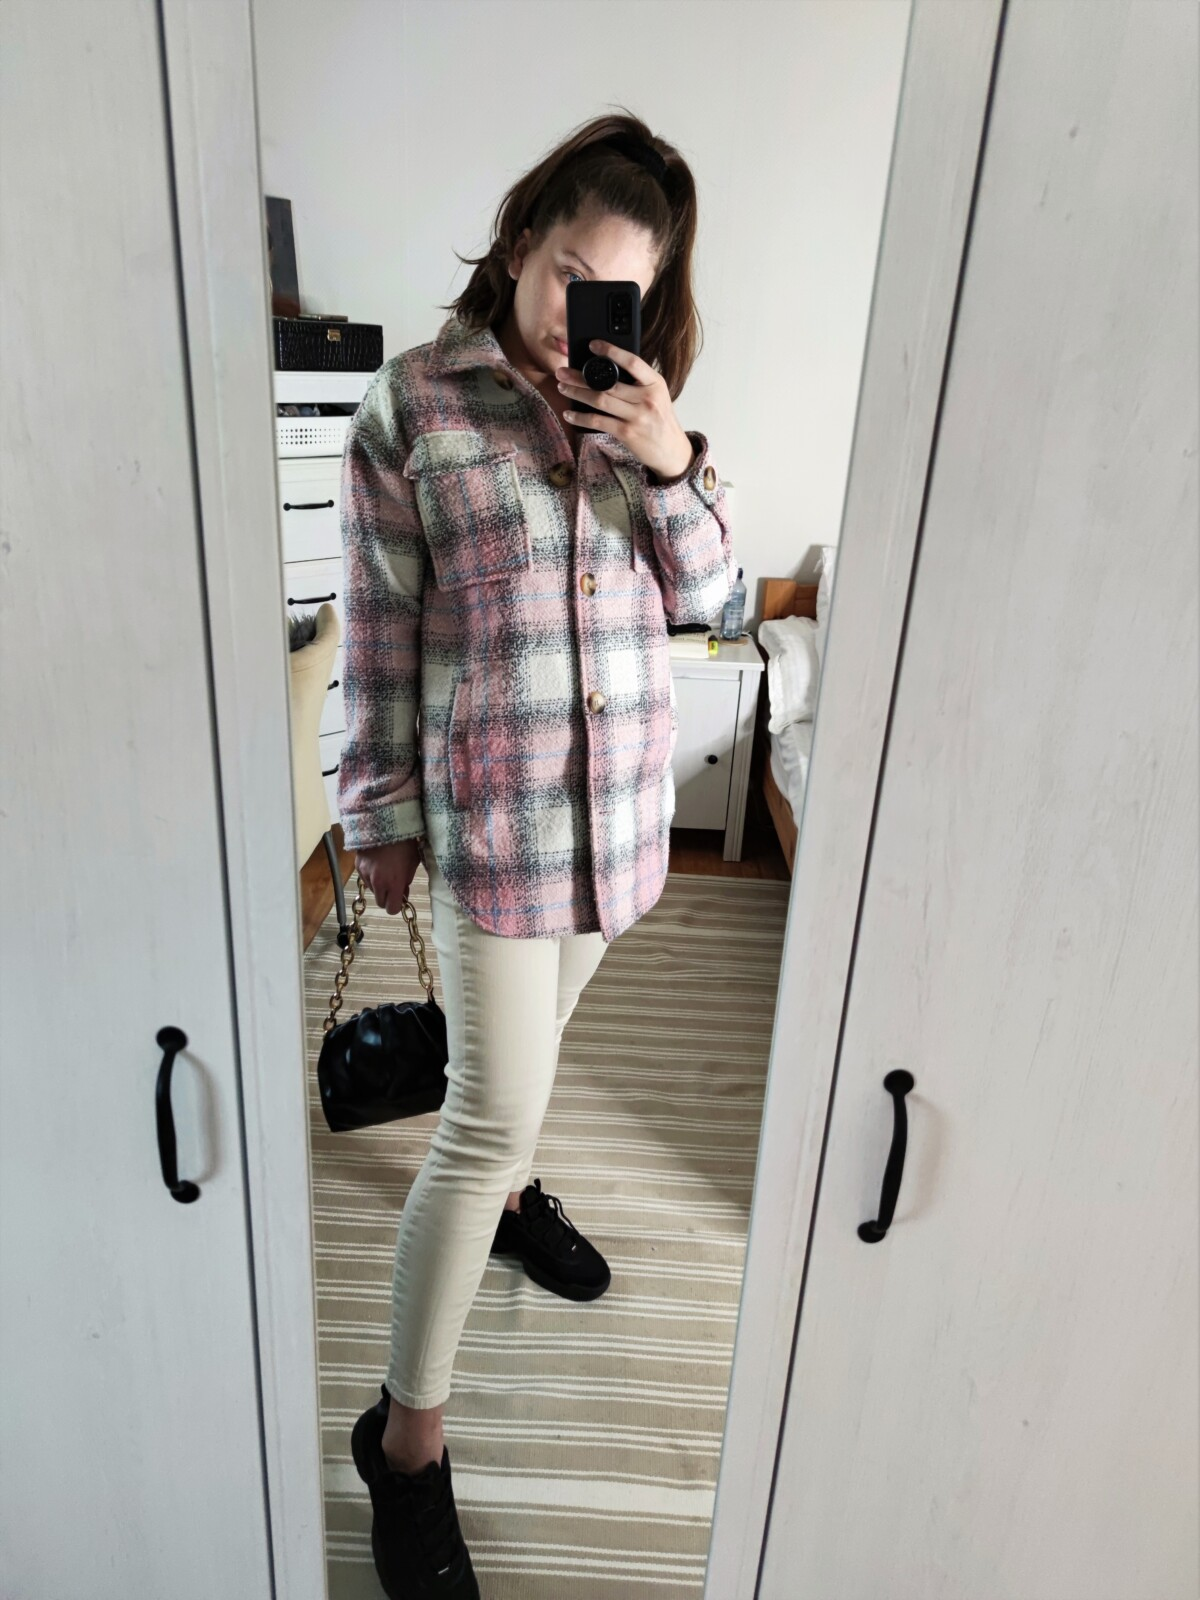 newin-innkjøp-nellycom-zalando-bubbleroom-shopping-shop-nettshopping-handel-nelly-isalicious1-isalicious-blogger-blogg-blog-outfit-outfits-antrekk-klær-stil-mote-trend-skjønnhet-isalicious.blogg